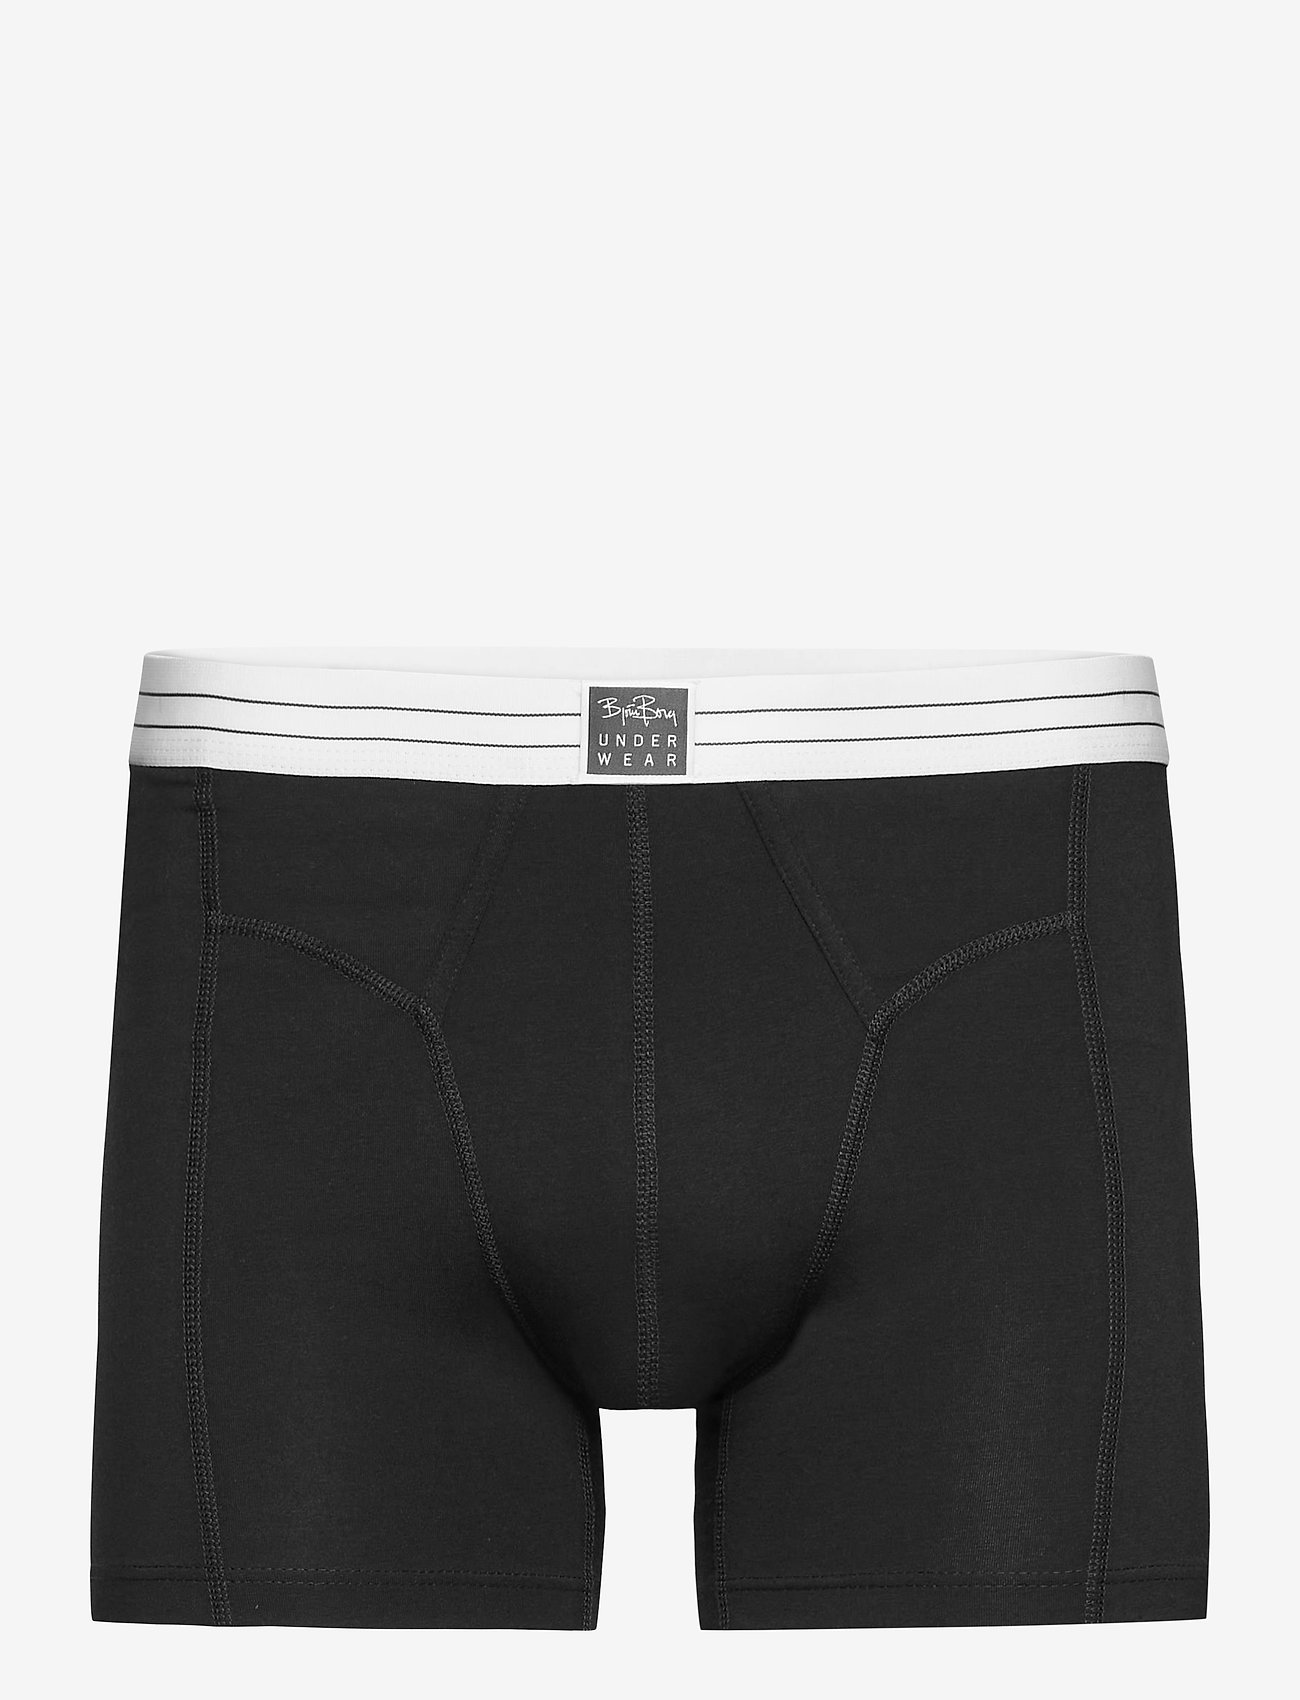 Björn Borg - SHORTS ORIGINAL SAMMY ORIGINAL SOLID - underwear - black beauty - 0